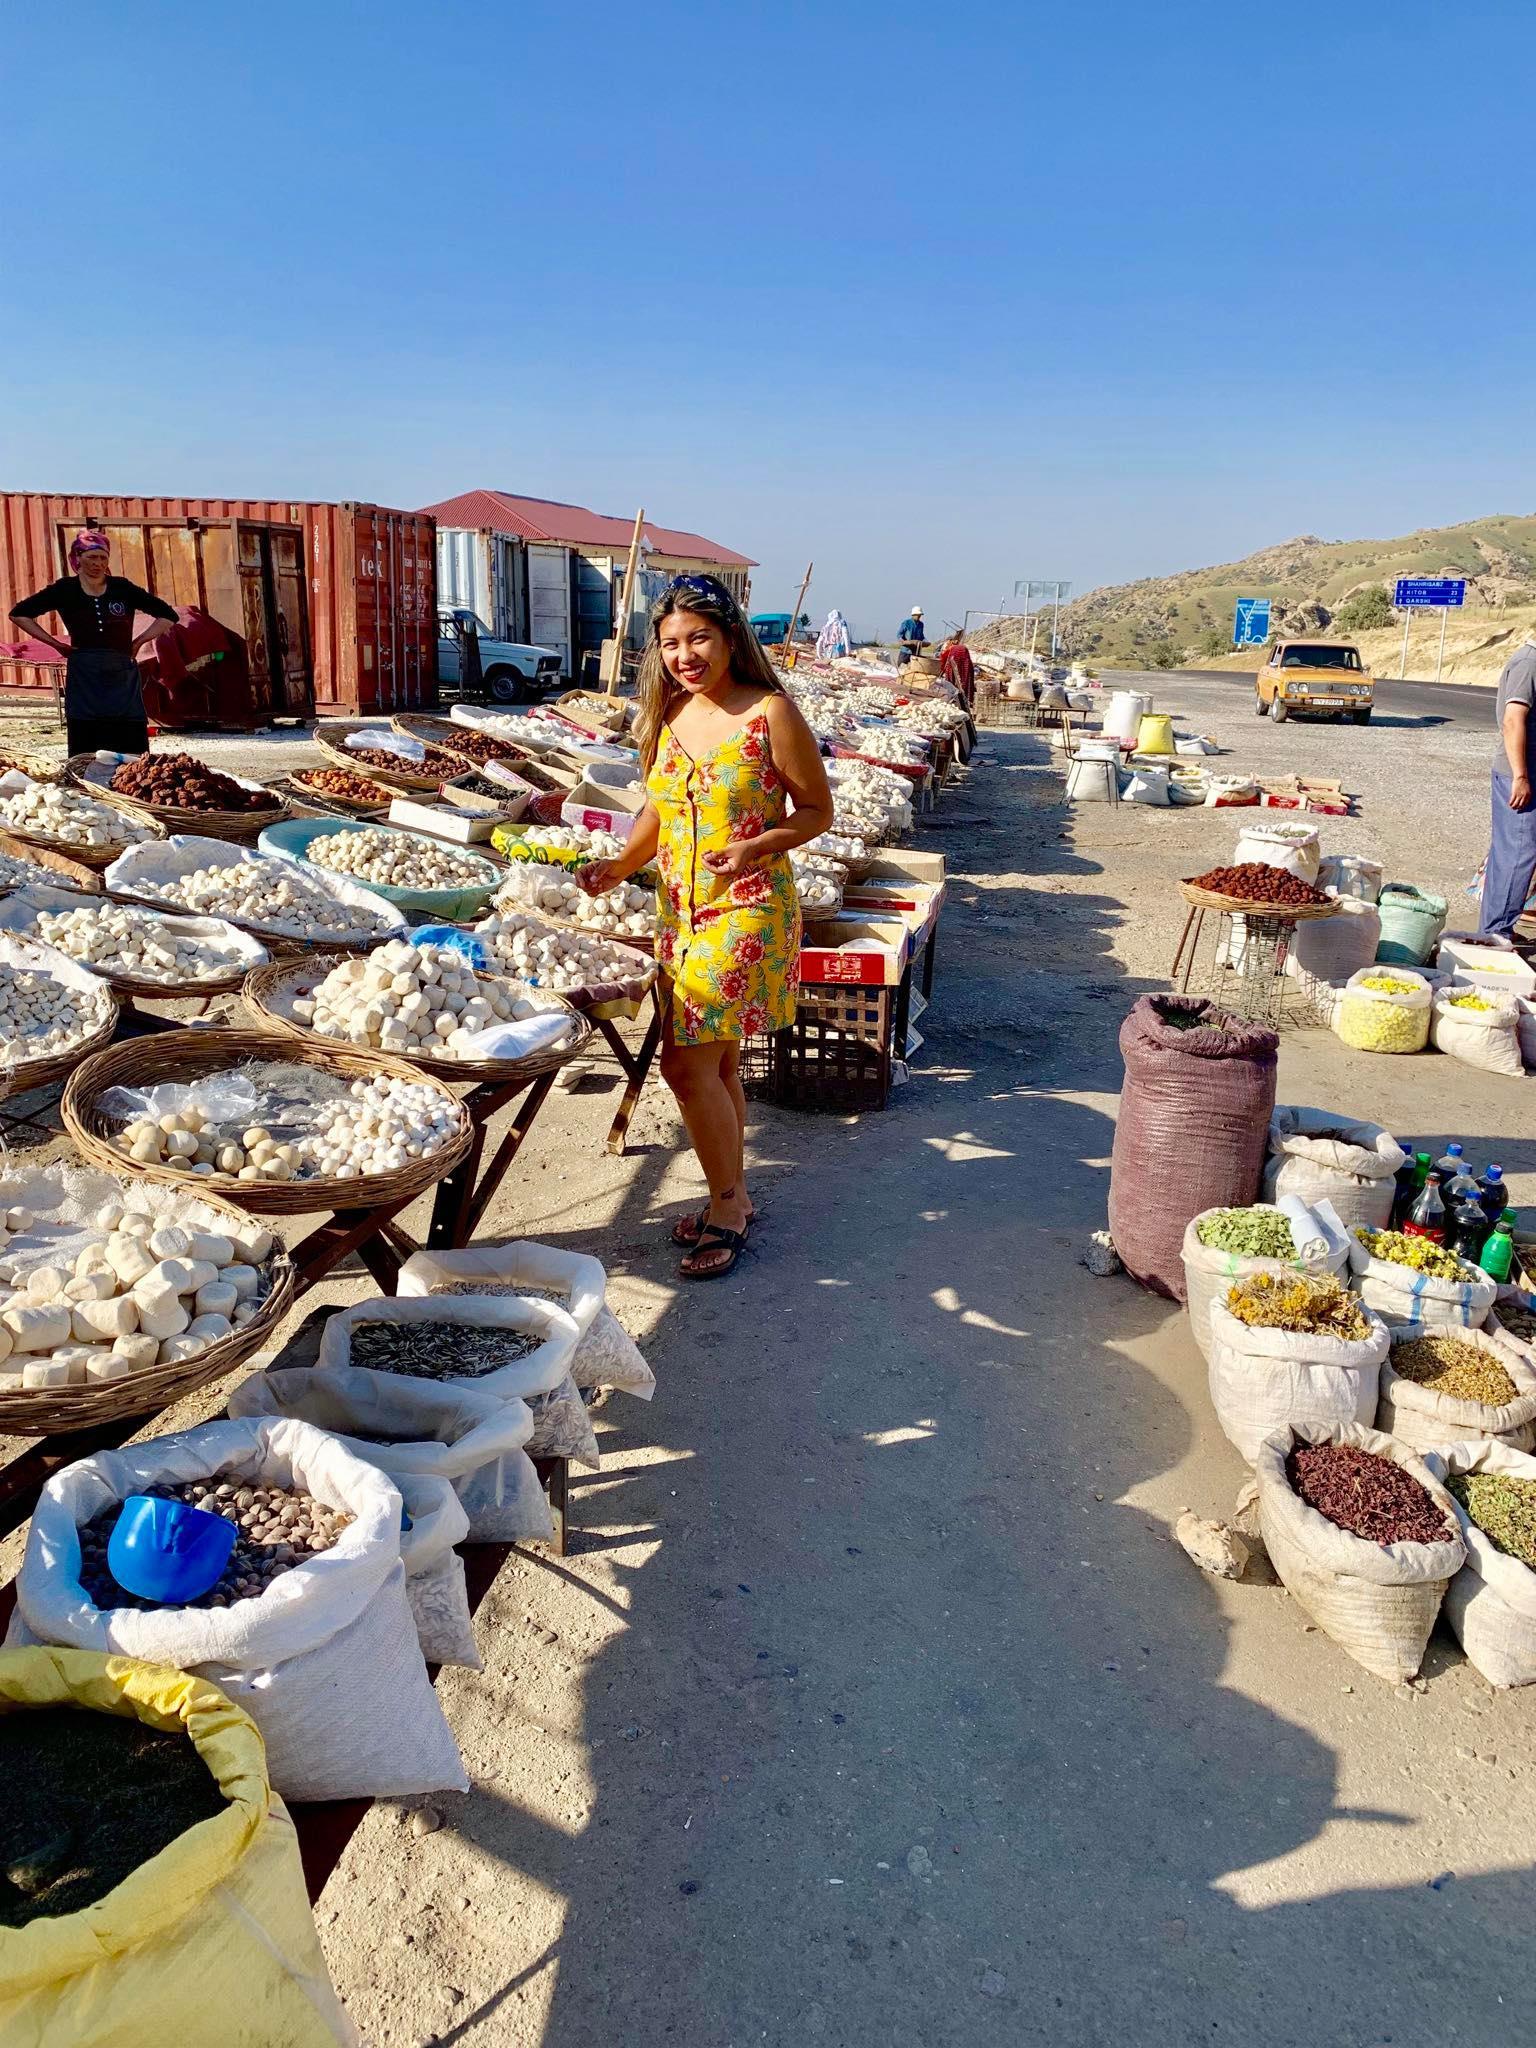 Train Ride and Overland Adventure in Uzbekistan3